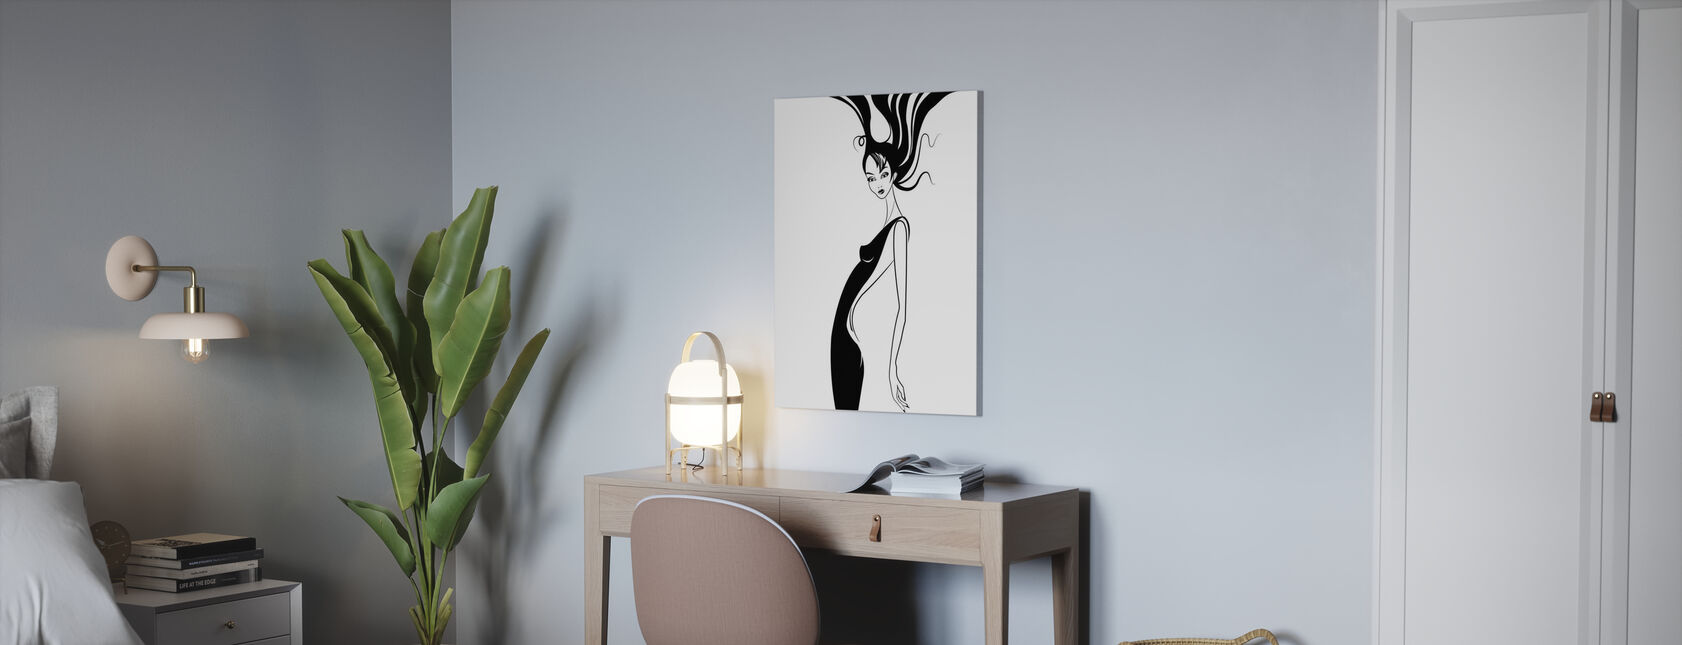 Retro Glamour - Canvas print - Office